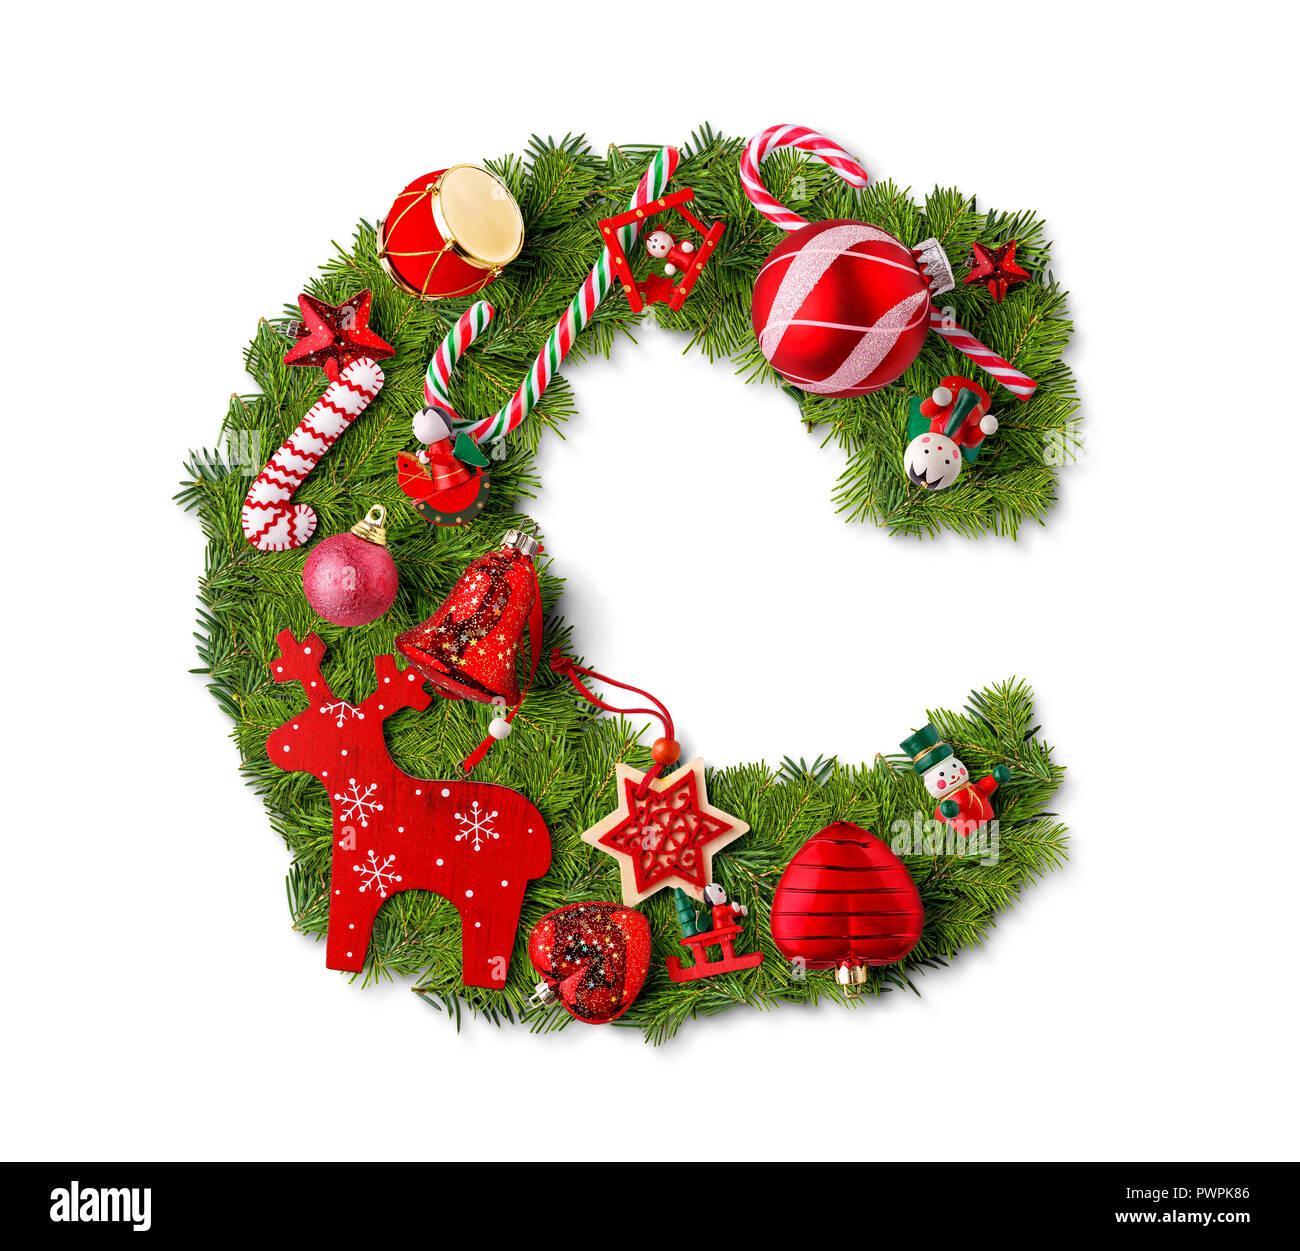 Christmas Alphabet.Christmas Alphabet Letter C Isolated On White Stock Photo